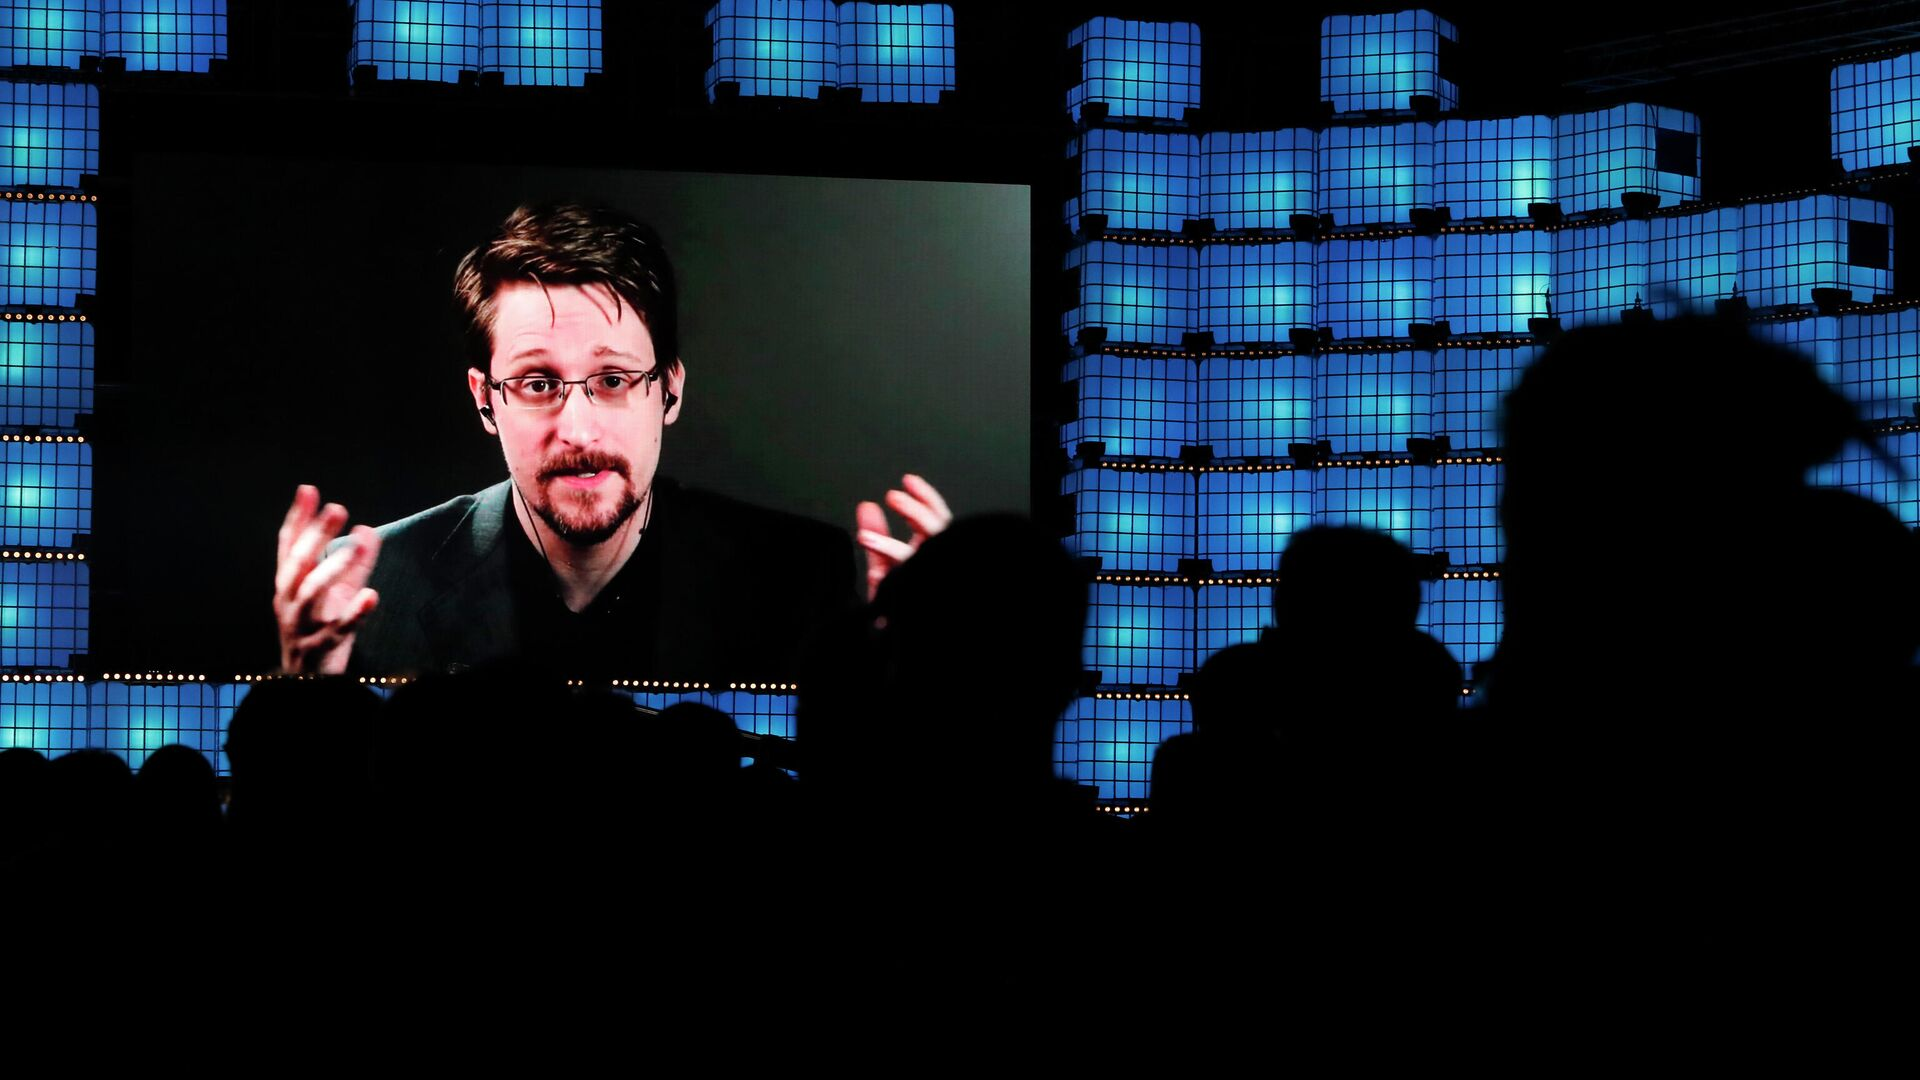 Эдвард Сноуден общается по видеосвязи с участникам технологической конференции Web Summit в Лиссабоне - РИА Новости, 1920, 02.11.2020